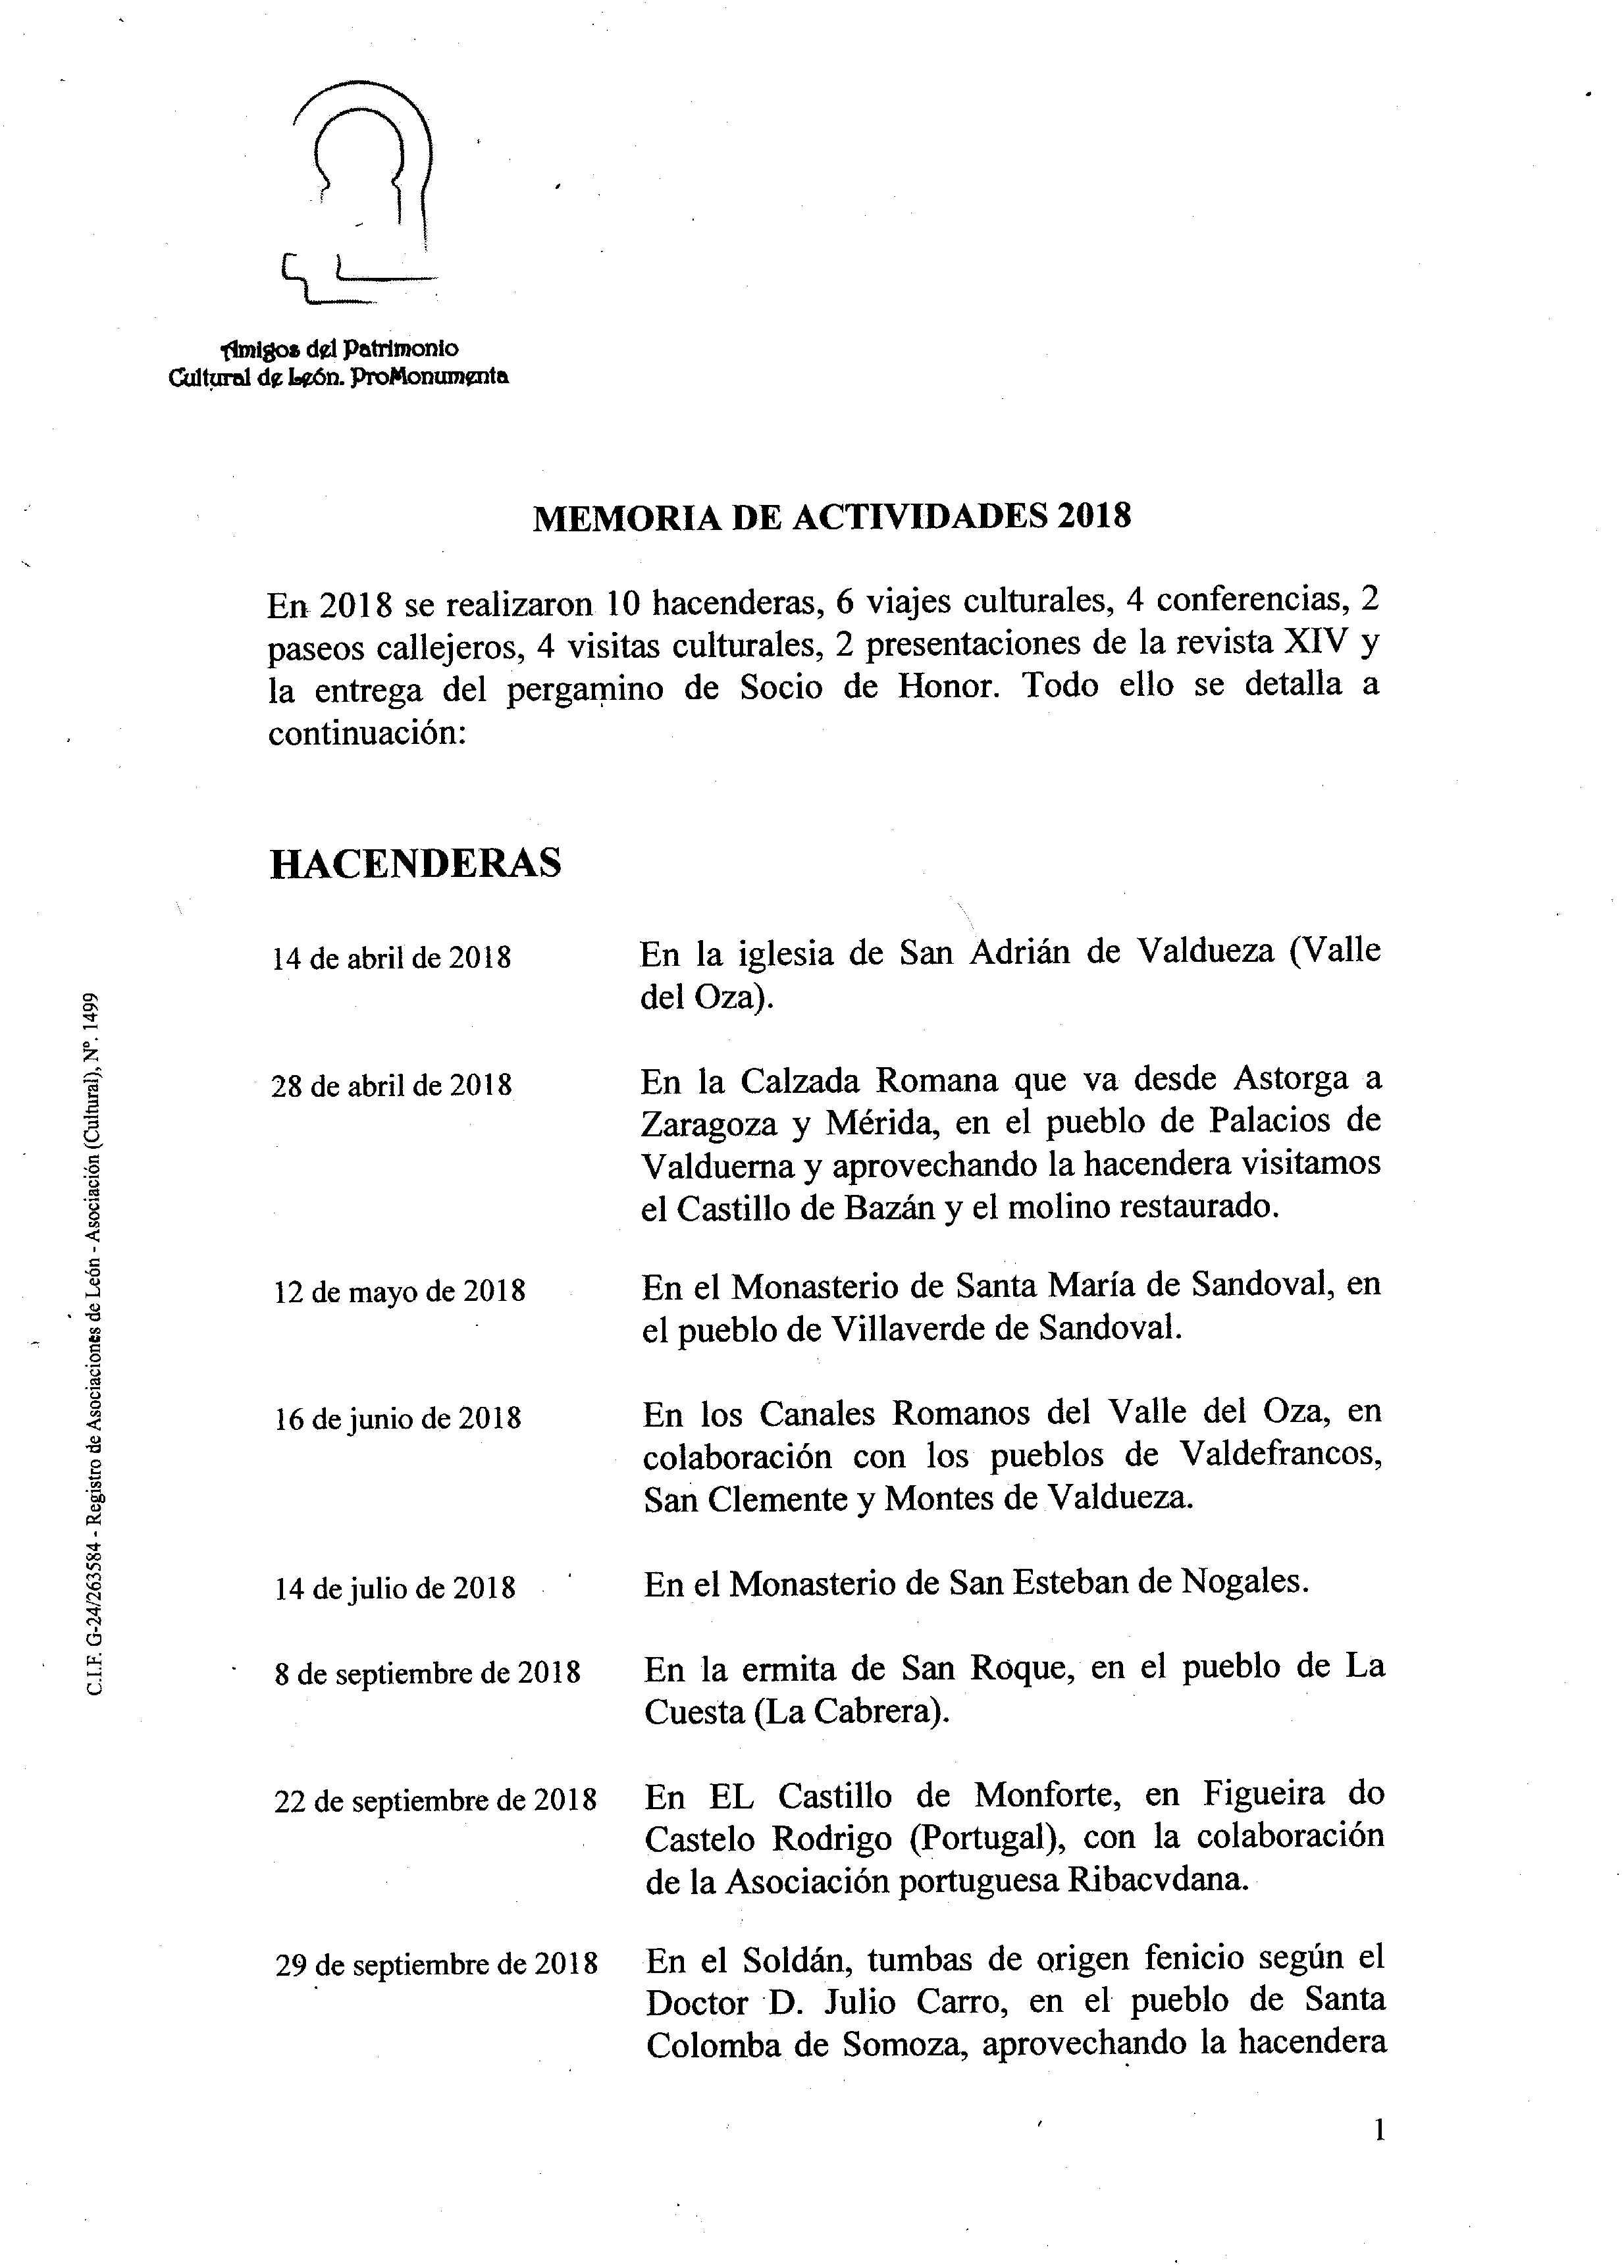 PROMONUMENTA ACTIVIDADES 2018001